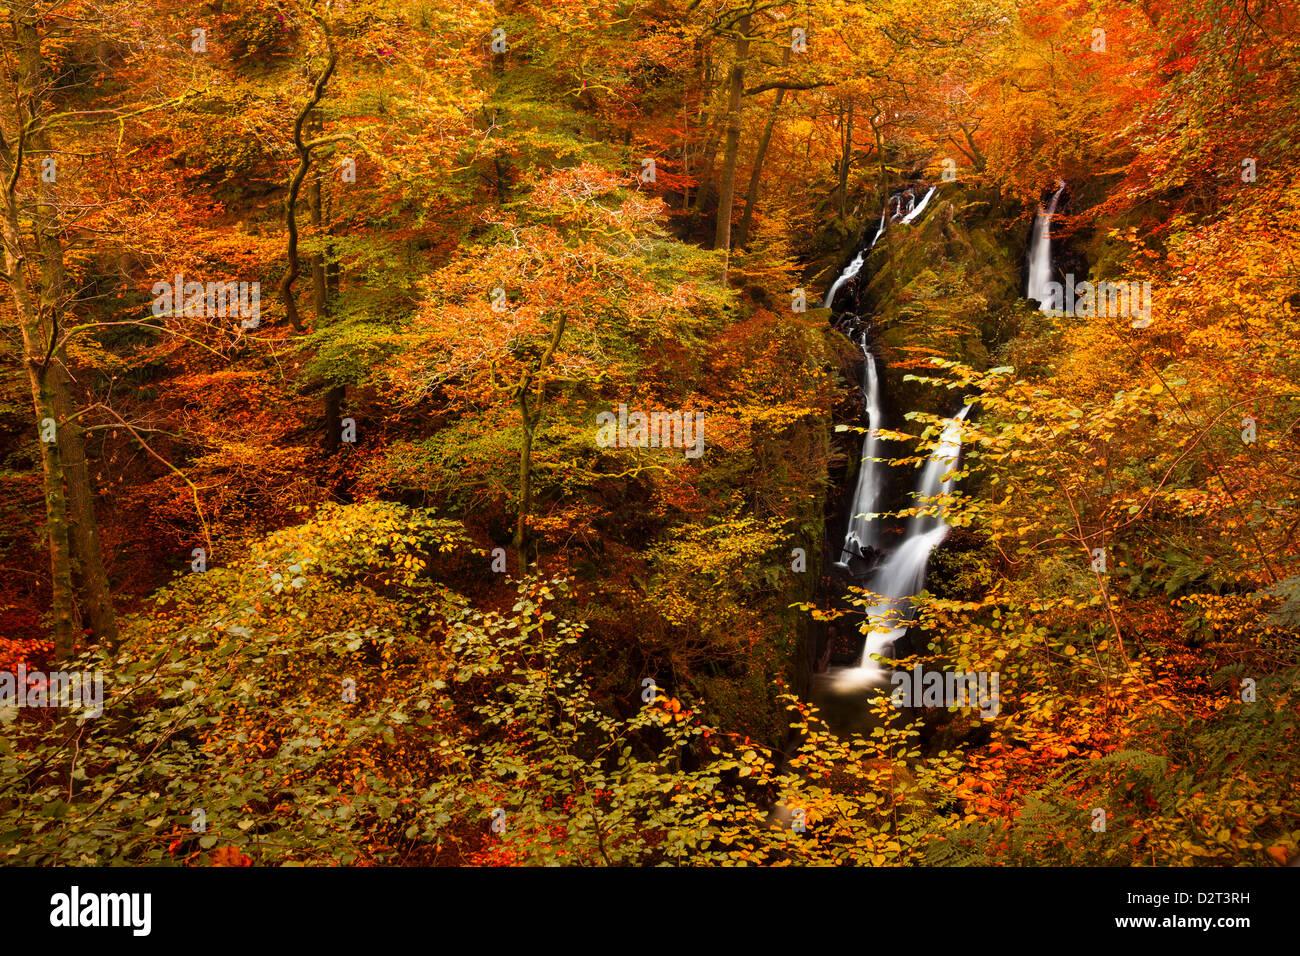 Stock fuerza Ghyll Cascada en el otoño, el Lake District National Park, Cumbria, Inglaterra, Reino Unido, Europa Imagen De Stock